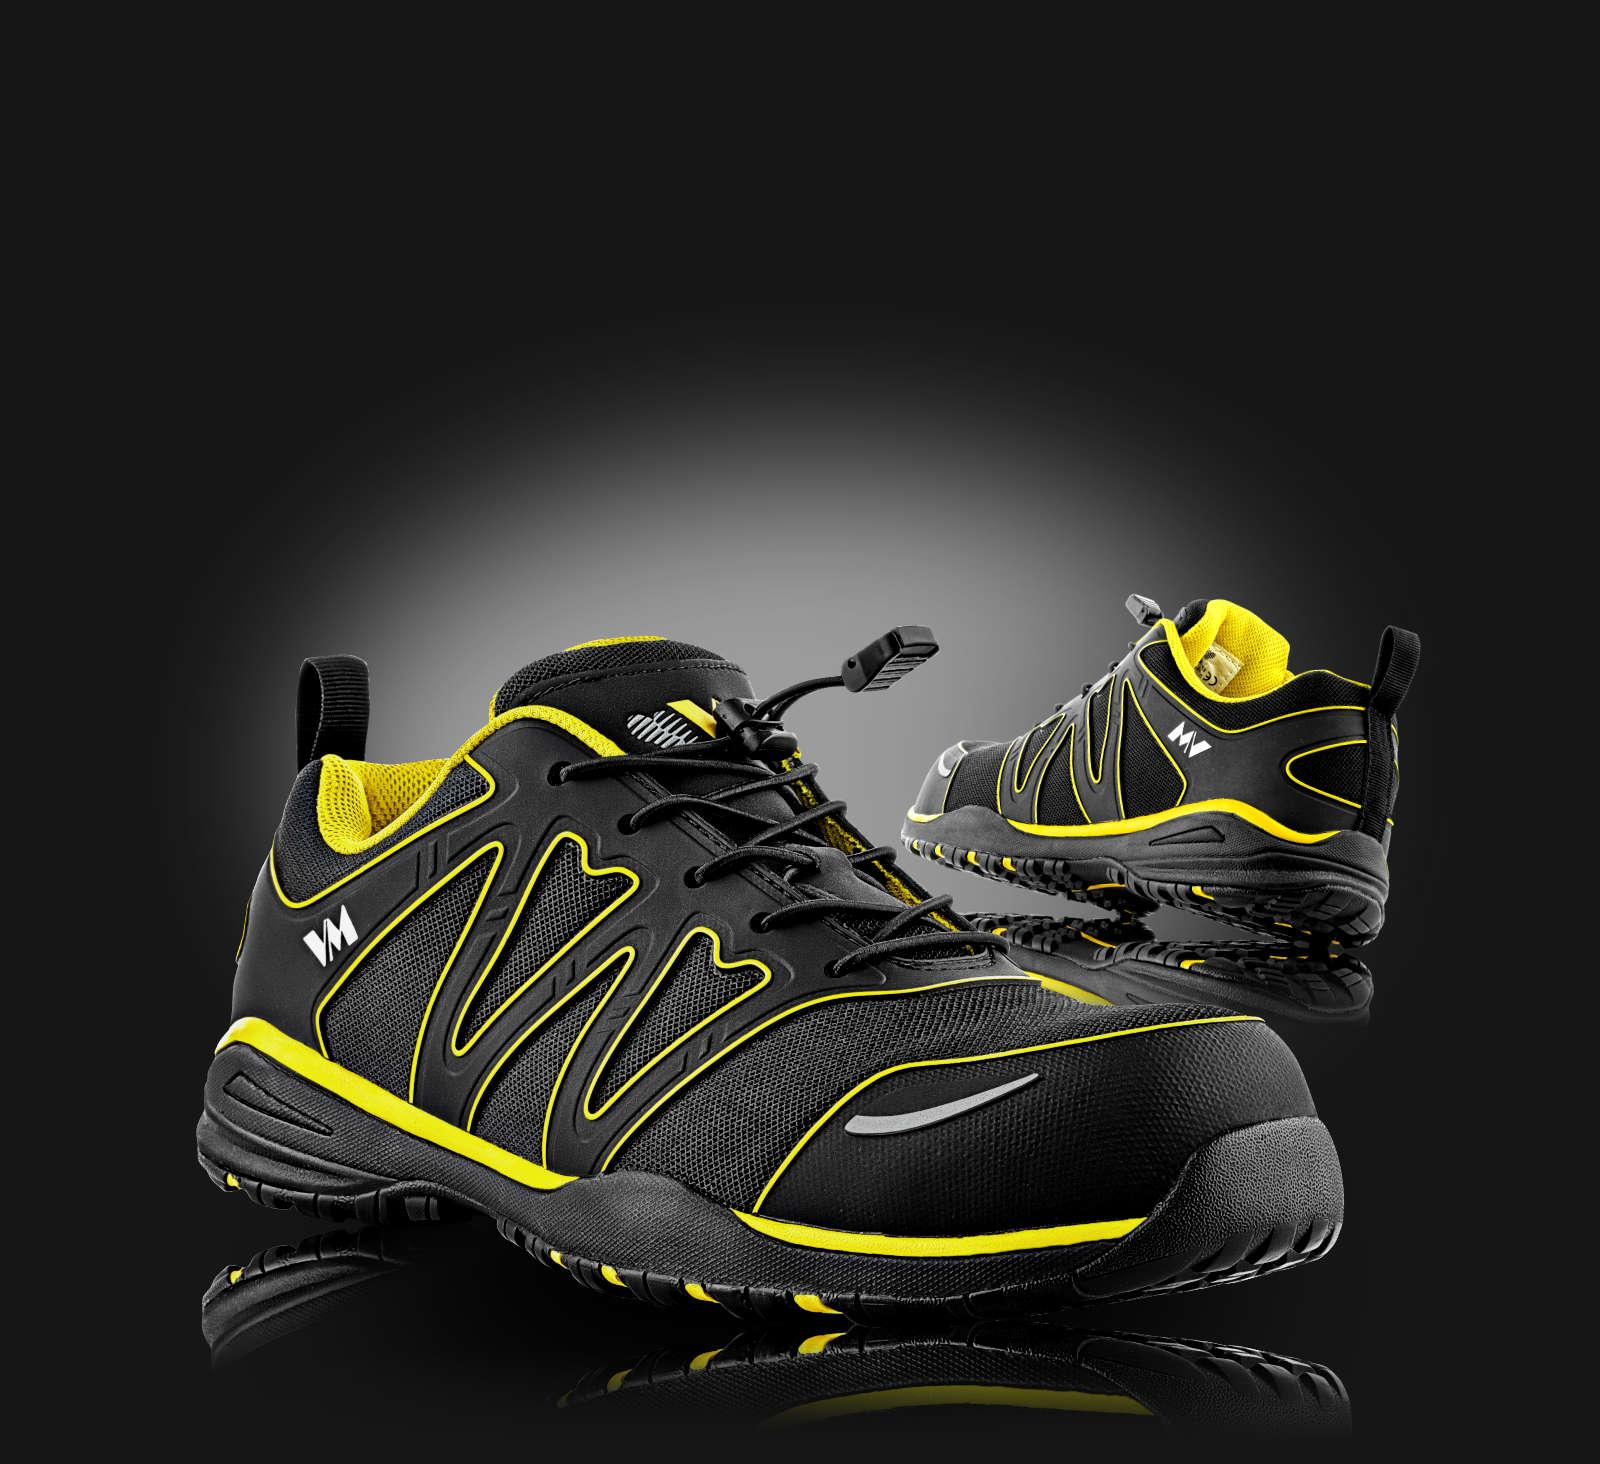 4345-S1 NASHVILLE obuv prac. 39